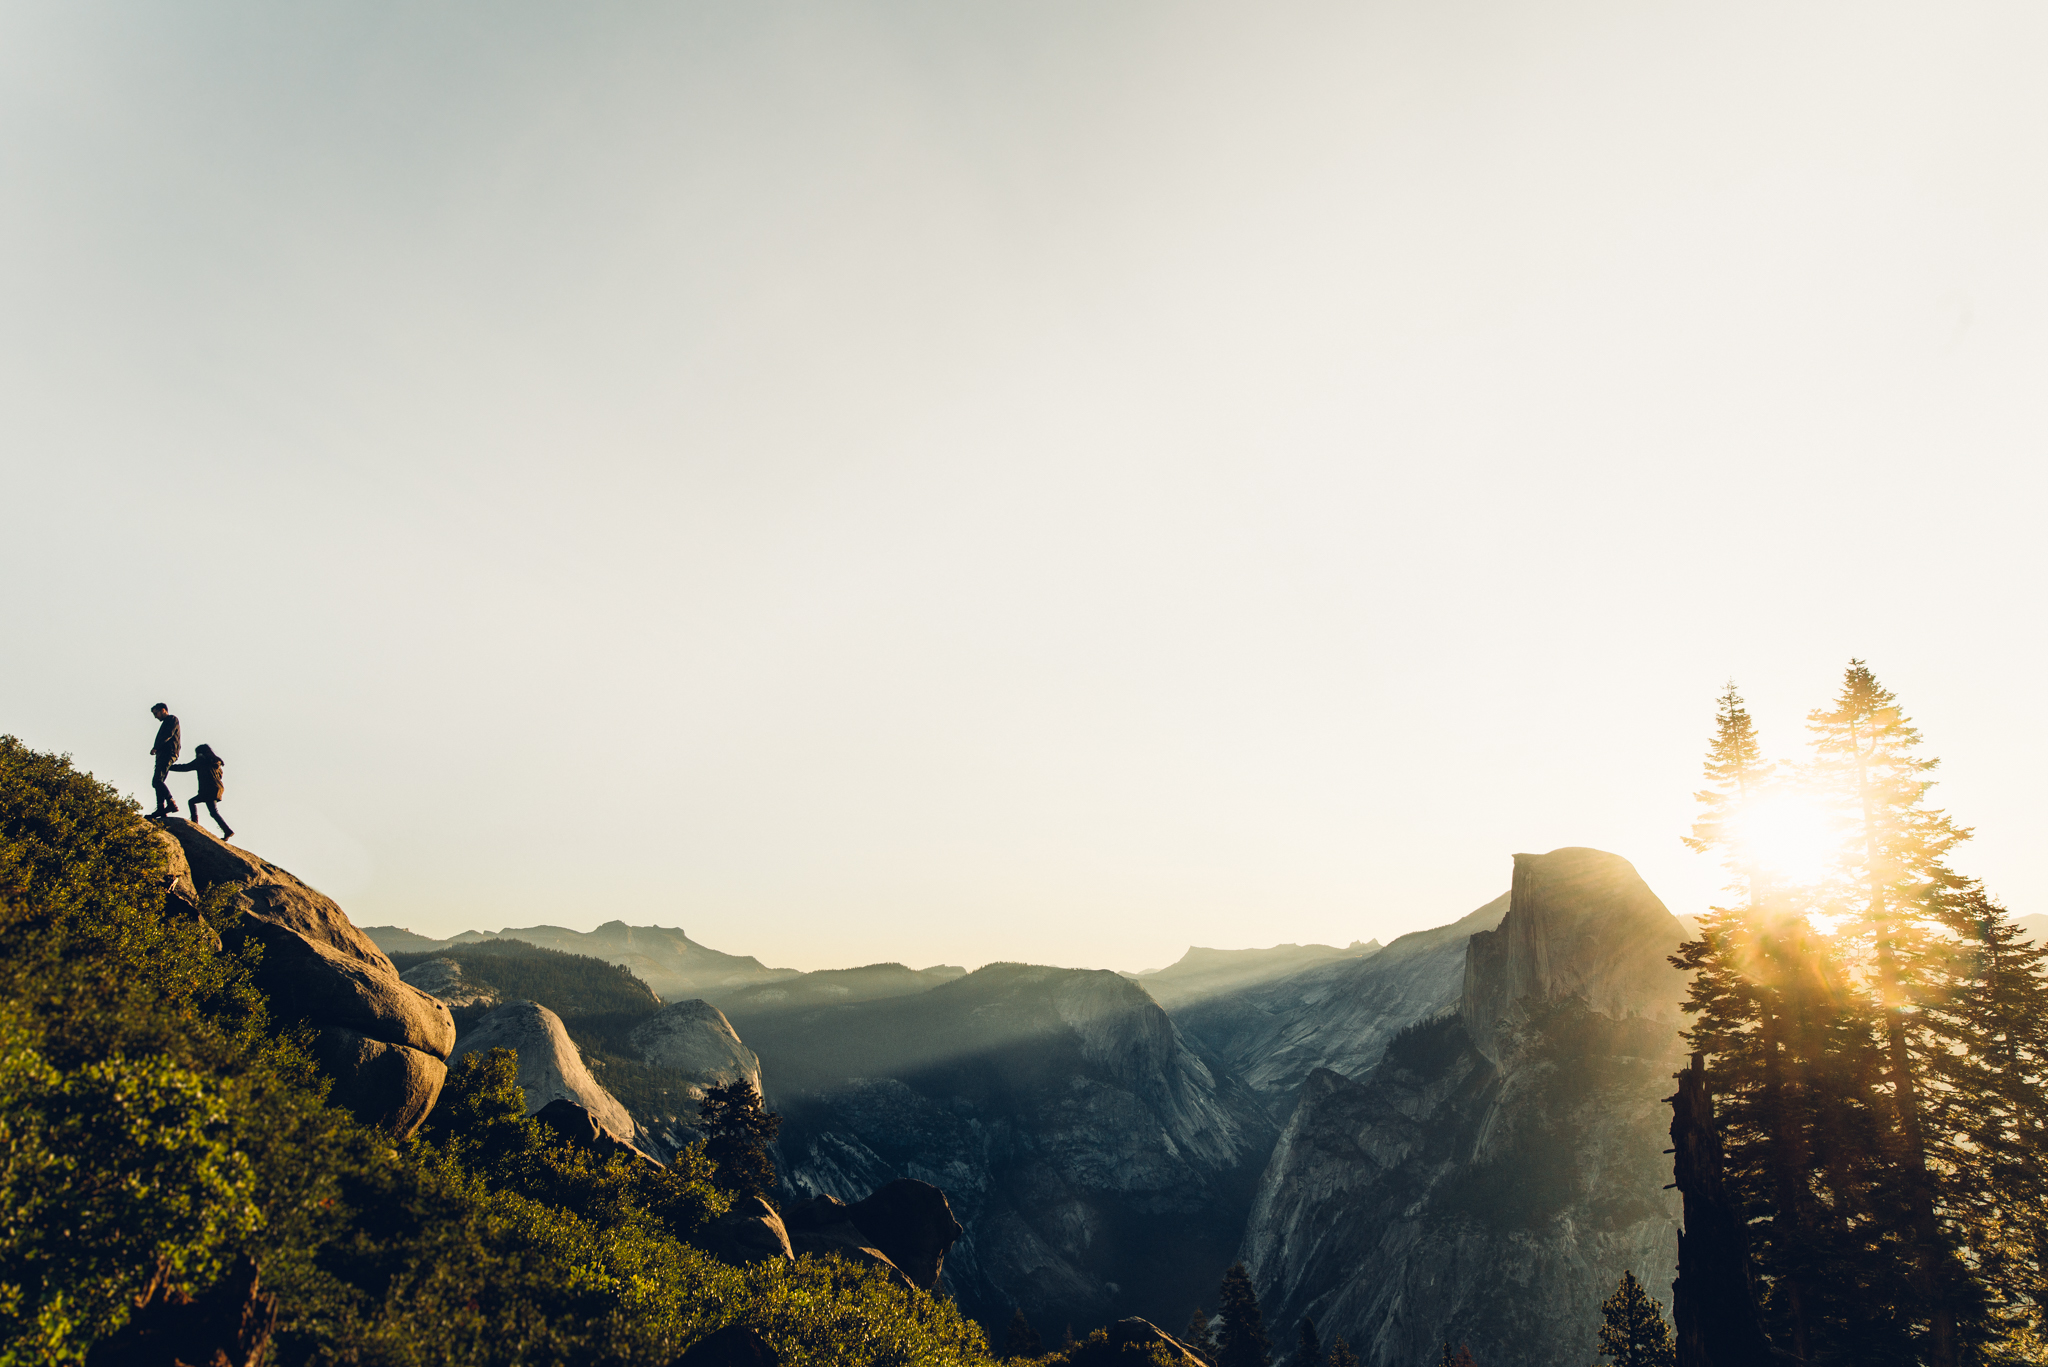 ©Isaiah & Taylor Photography - Los Angeles Destination Wedding Photographer - Yosemite National Park Hiking Adventure Engagement - Glacier Point Sunrise-027.jpg